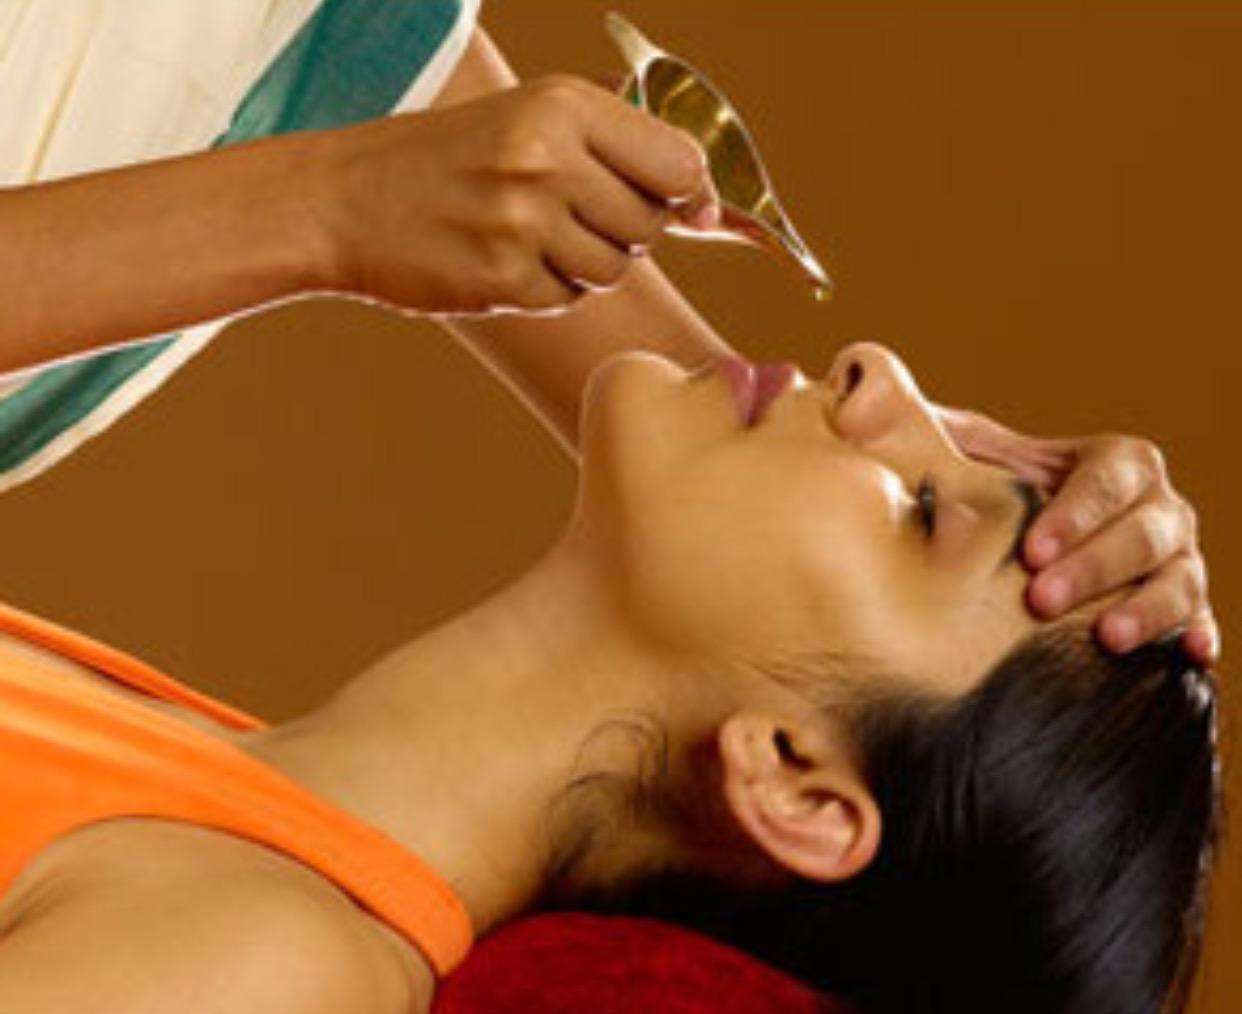 PunjabKesari, Nari, पंचकर्म नस्य शिरोधारा थेरेपी, Dust Allergy, Health Tips Image